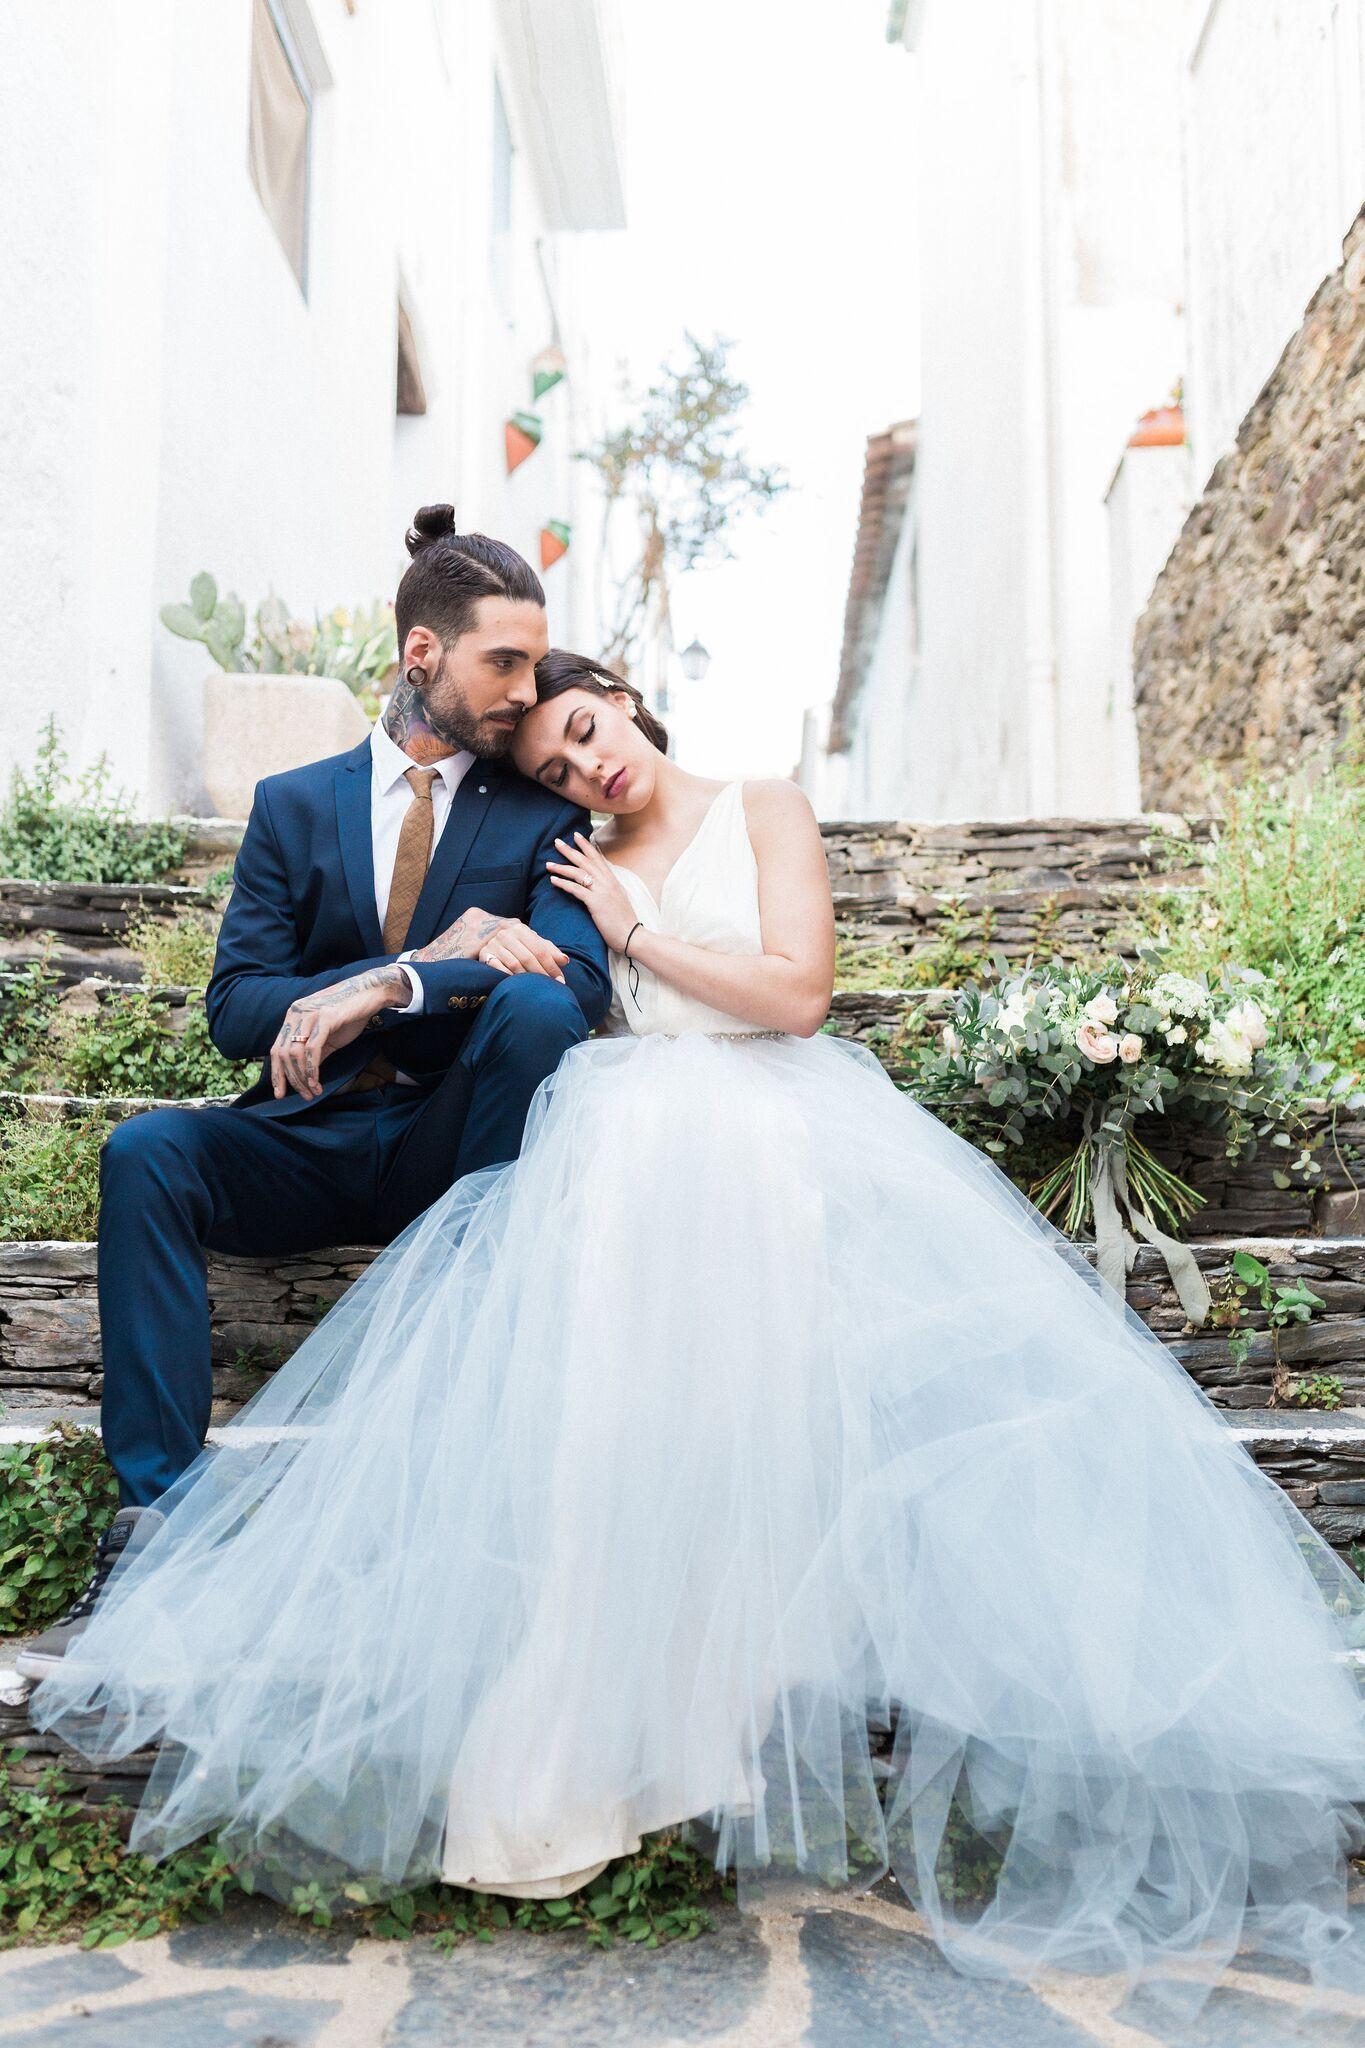 Chicago wedding dresses  Alyssa Kristin Bridal  Chicago Wedding Dress Designer  Peaches